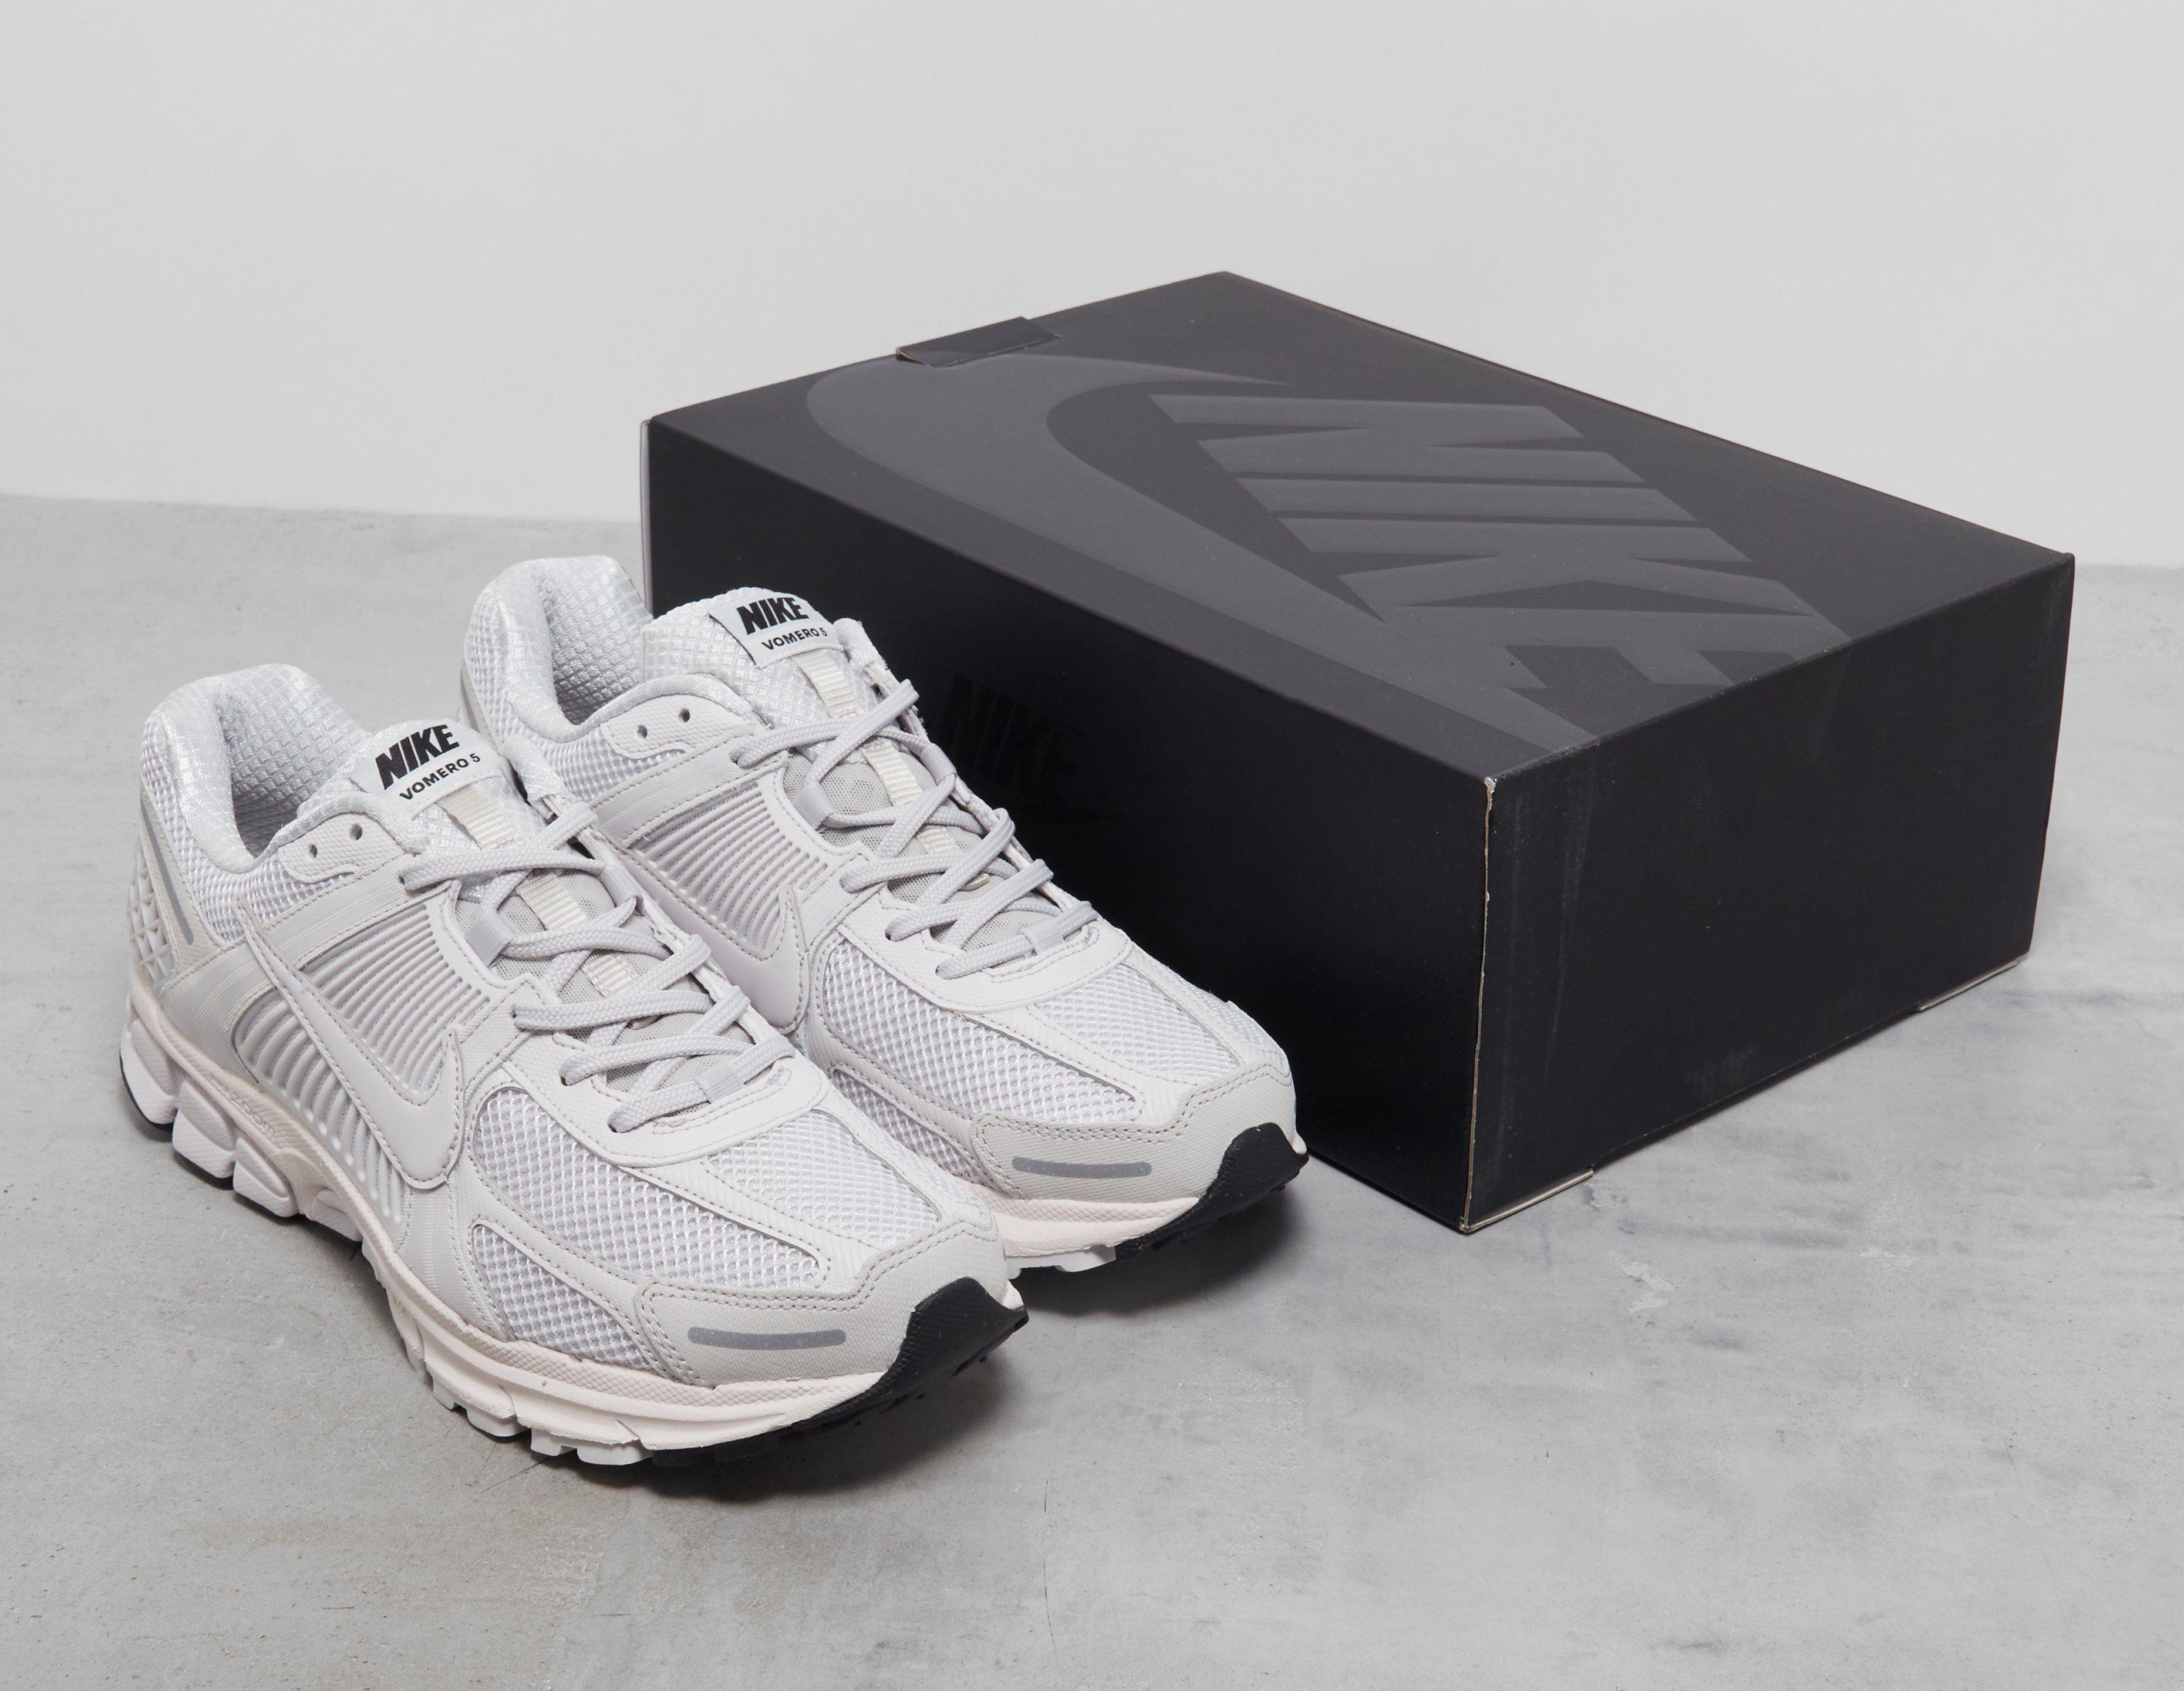 Nike Zoom Vomero 5